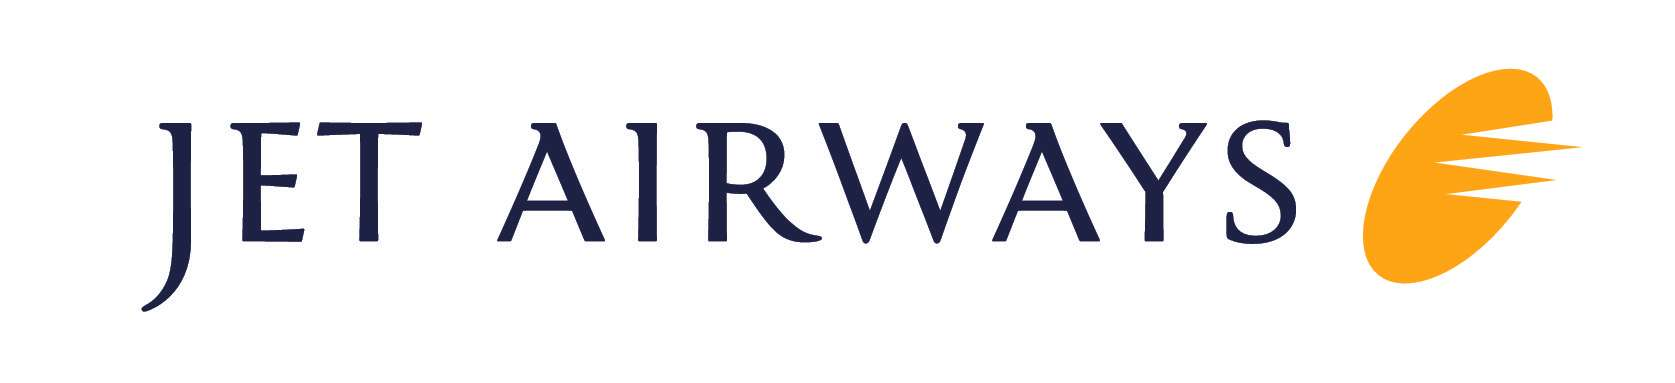 insight preregistration for jet airways customers isha